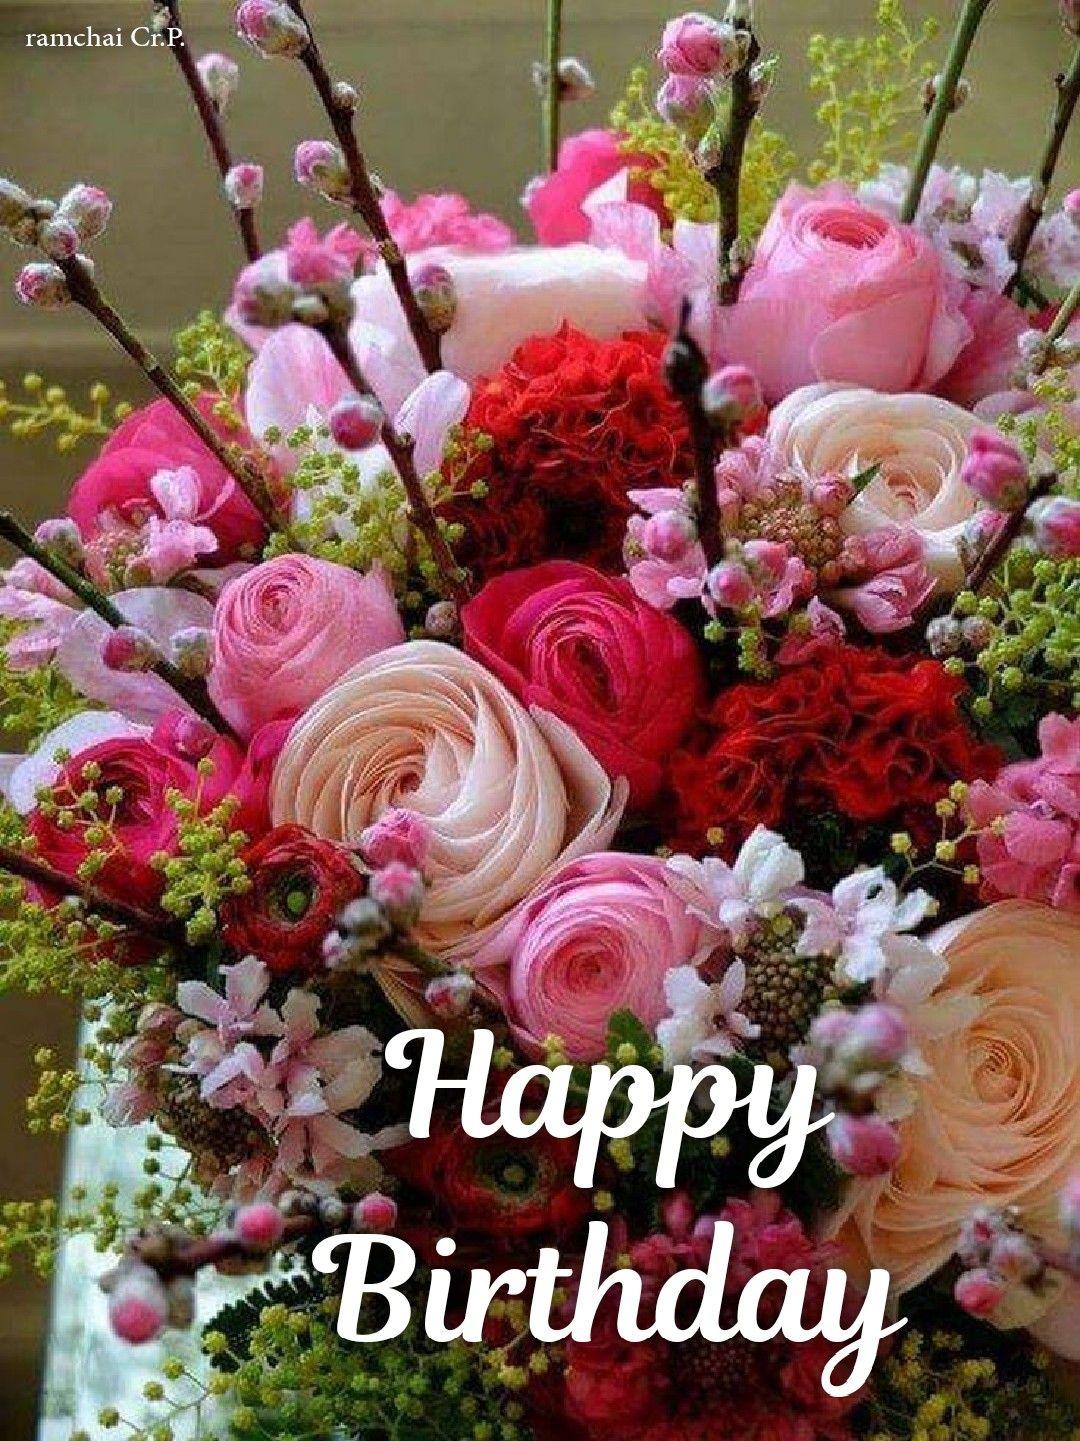 Pin By Guniz Maden On Bday In 2020 Birthday Wishes Flowers Birthday Flowers Birthday Flowers Arrangements